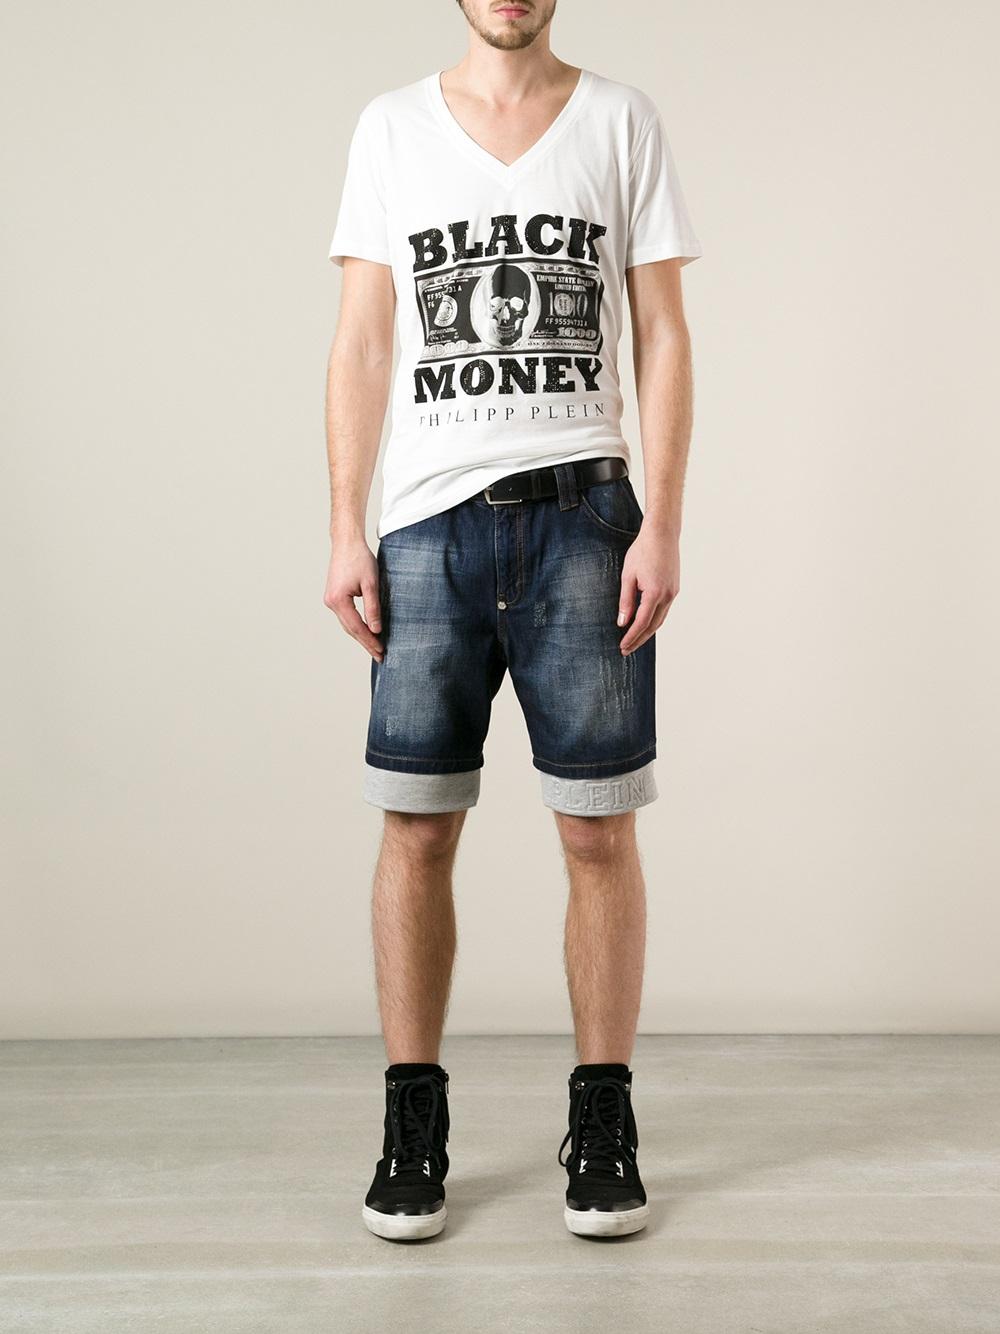 lyst philipp plein black money t shirt in white for men. Black Bedroom Furniture Sets. Home Design Ideas